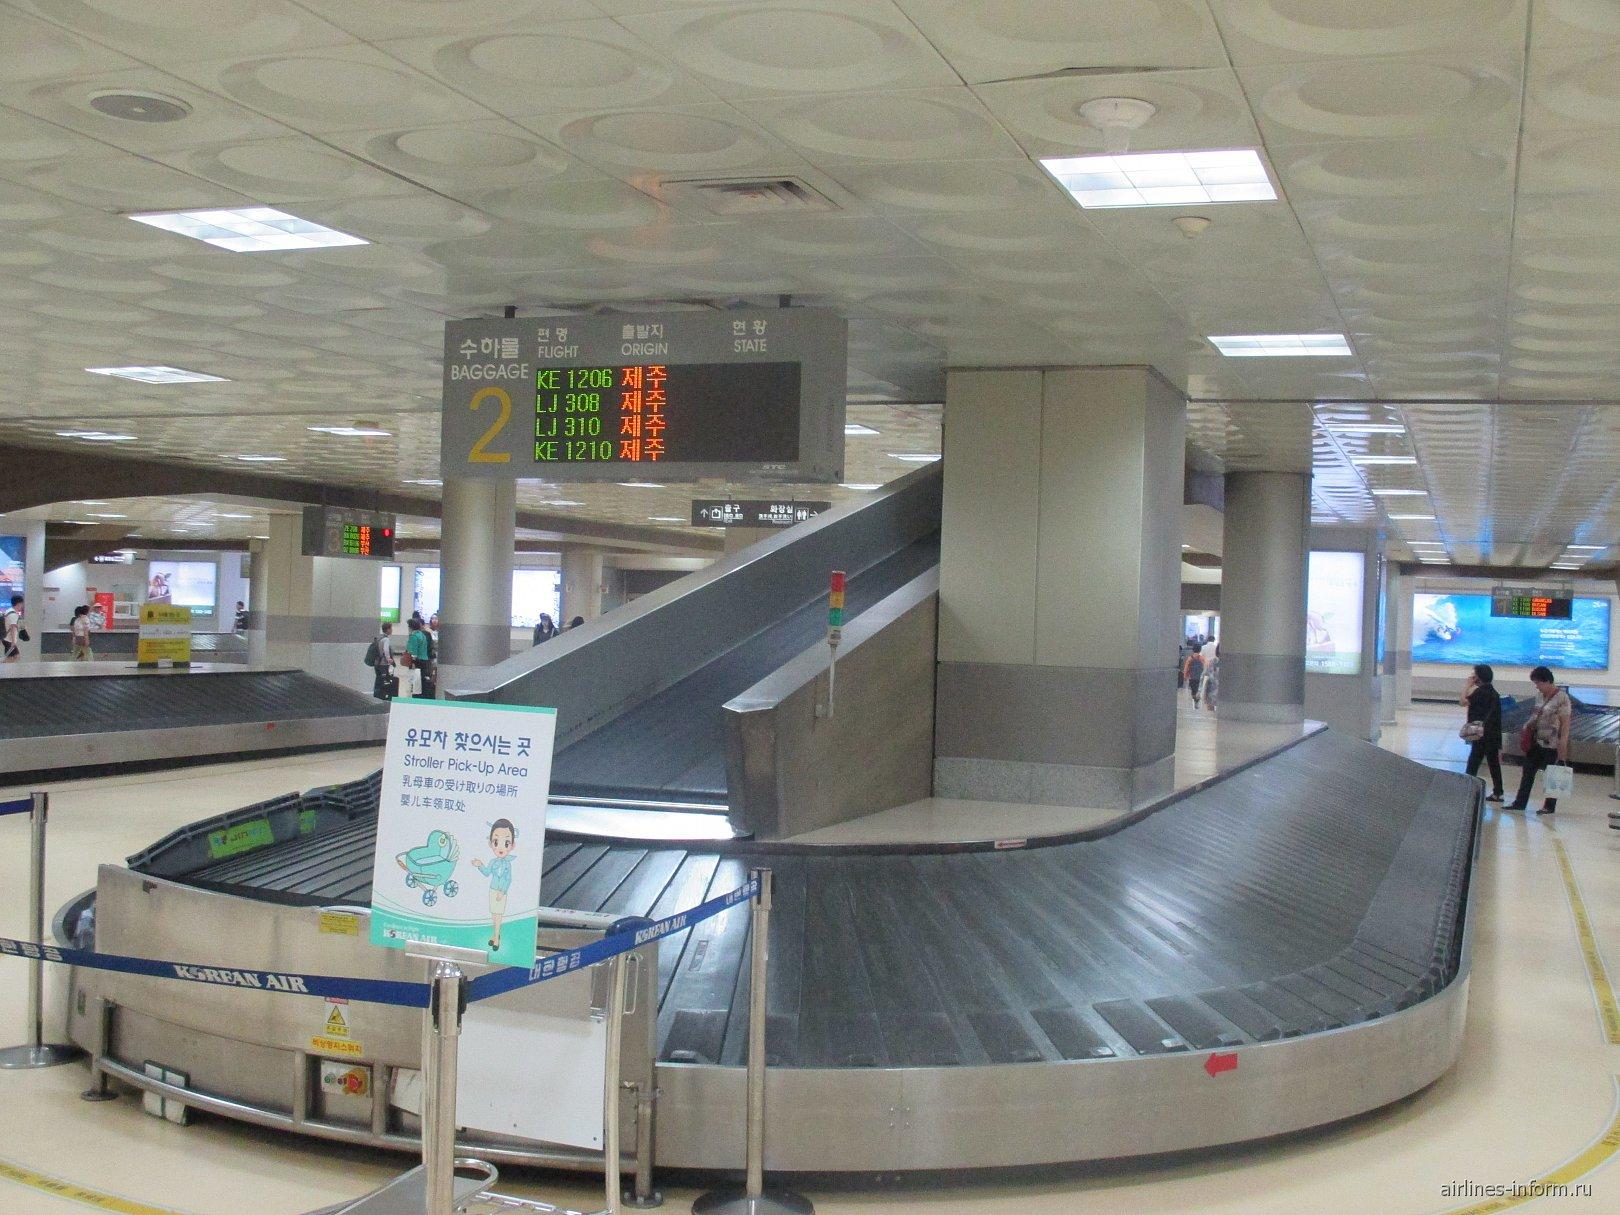 Зал выдачи багажа в аэропорту Сеул Гимпо